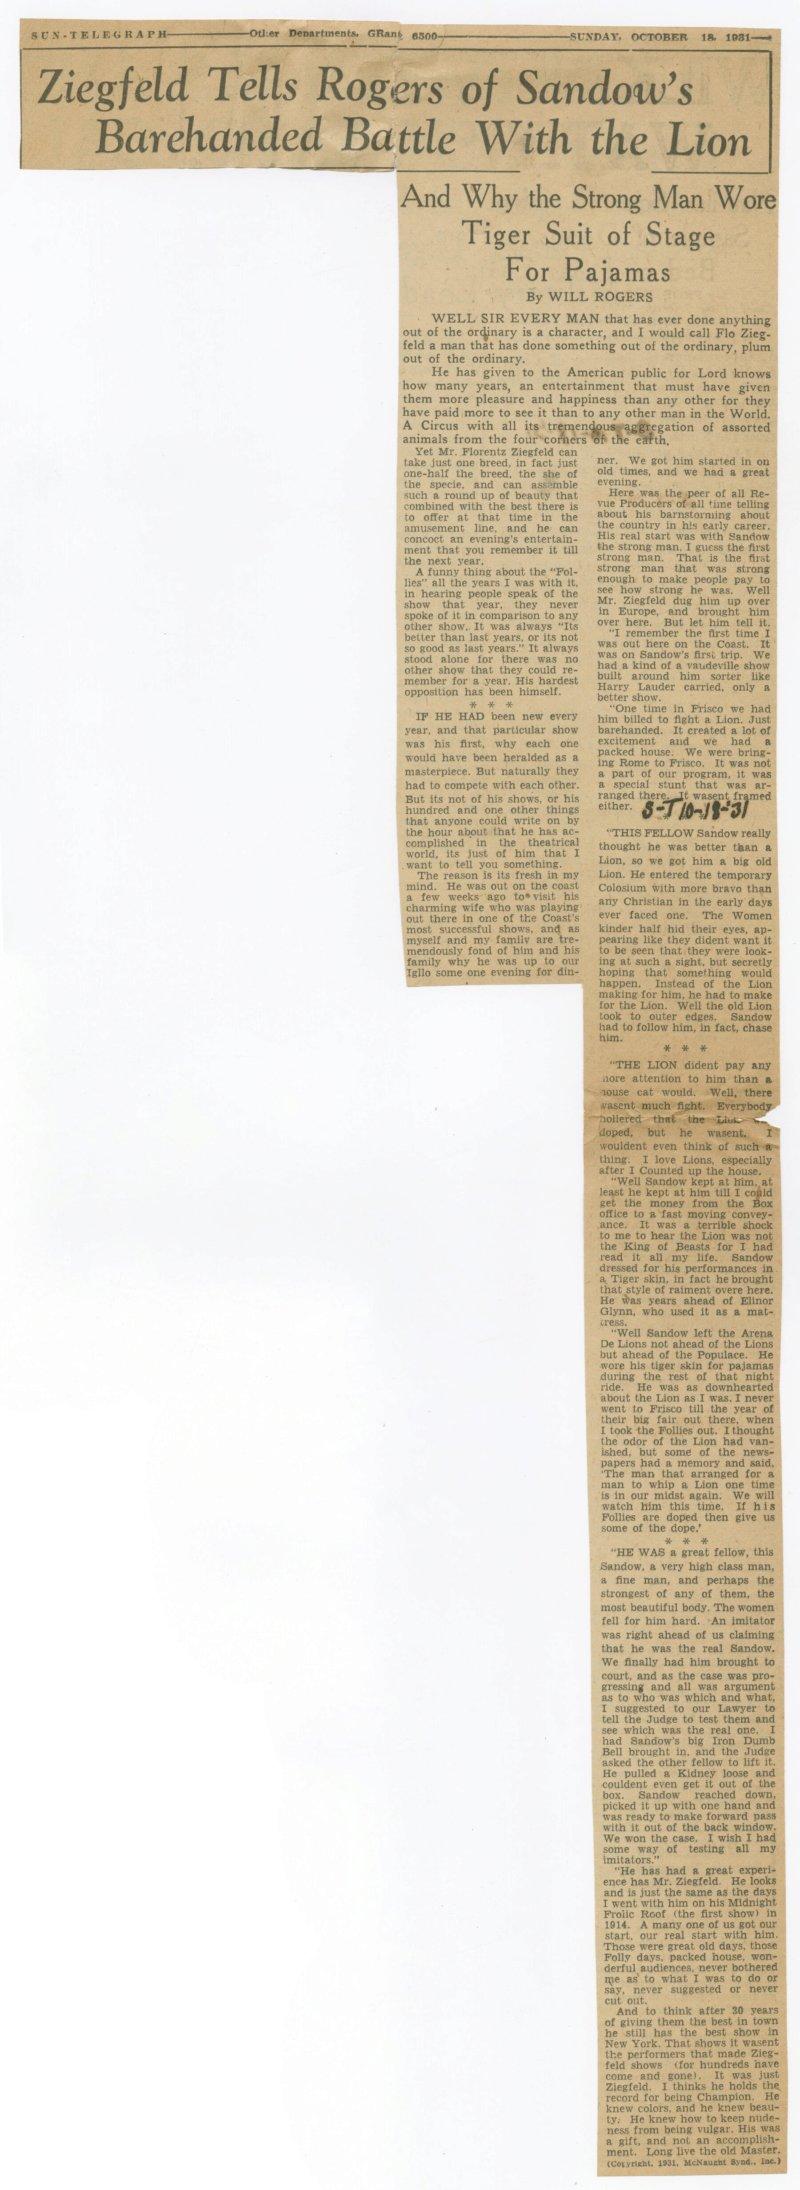 Ziegfeld Tells Rogers of Sandow's Barehanded Battle with the Lion